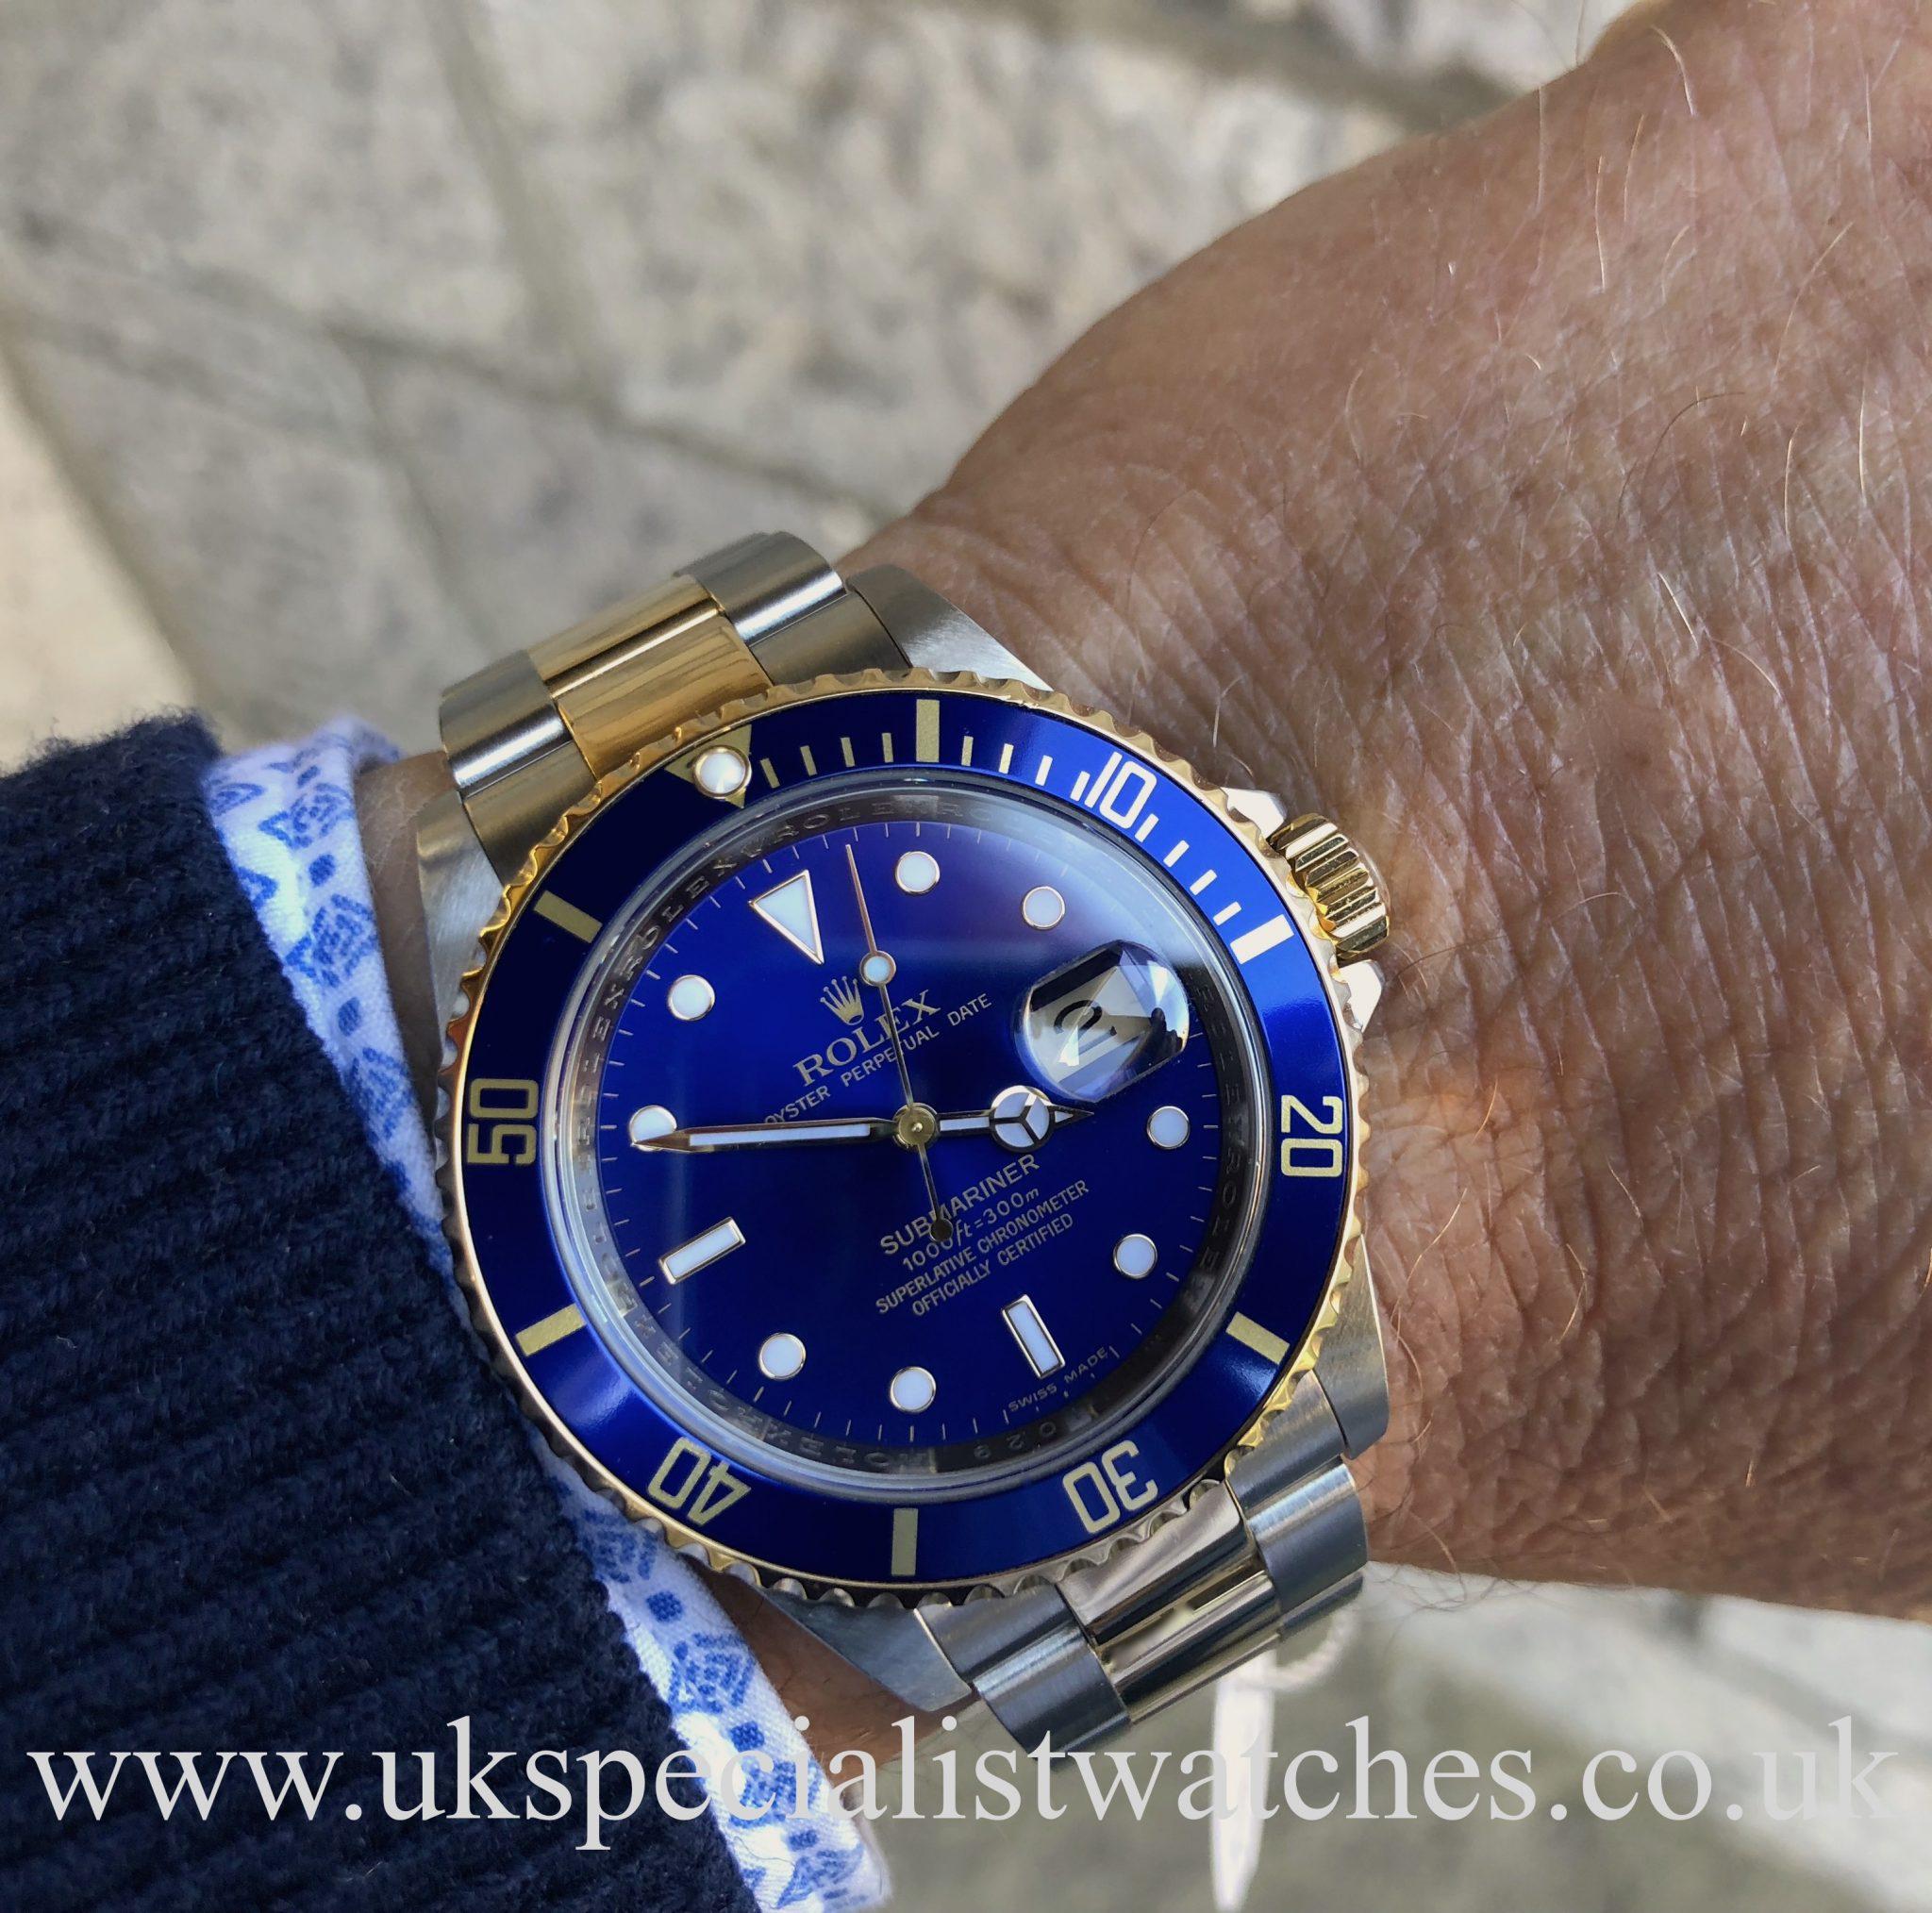 Rolex Submariner Steel & 18ct Gold - 16613 - Final Edition ...